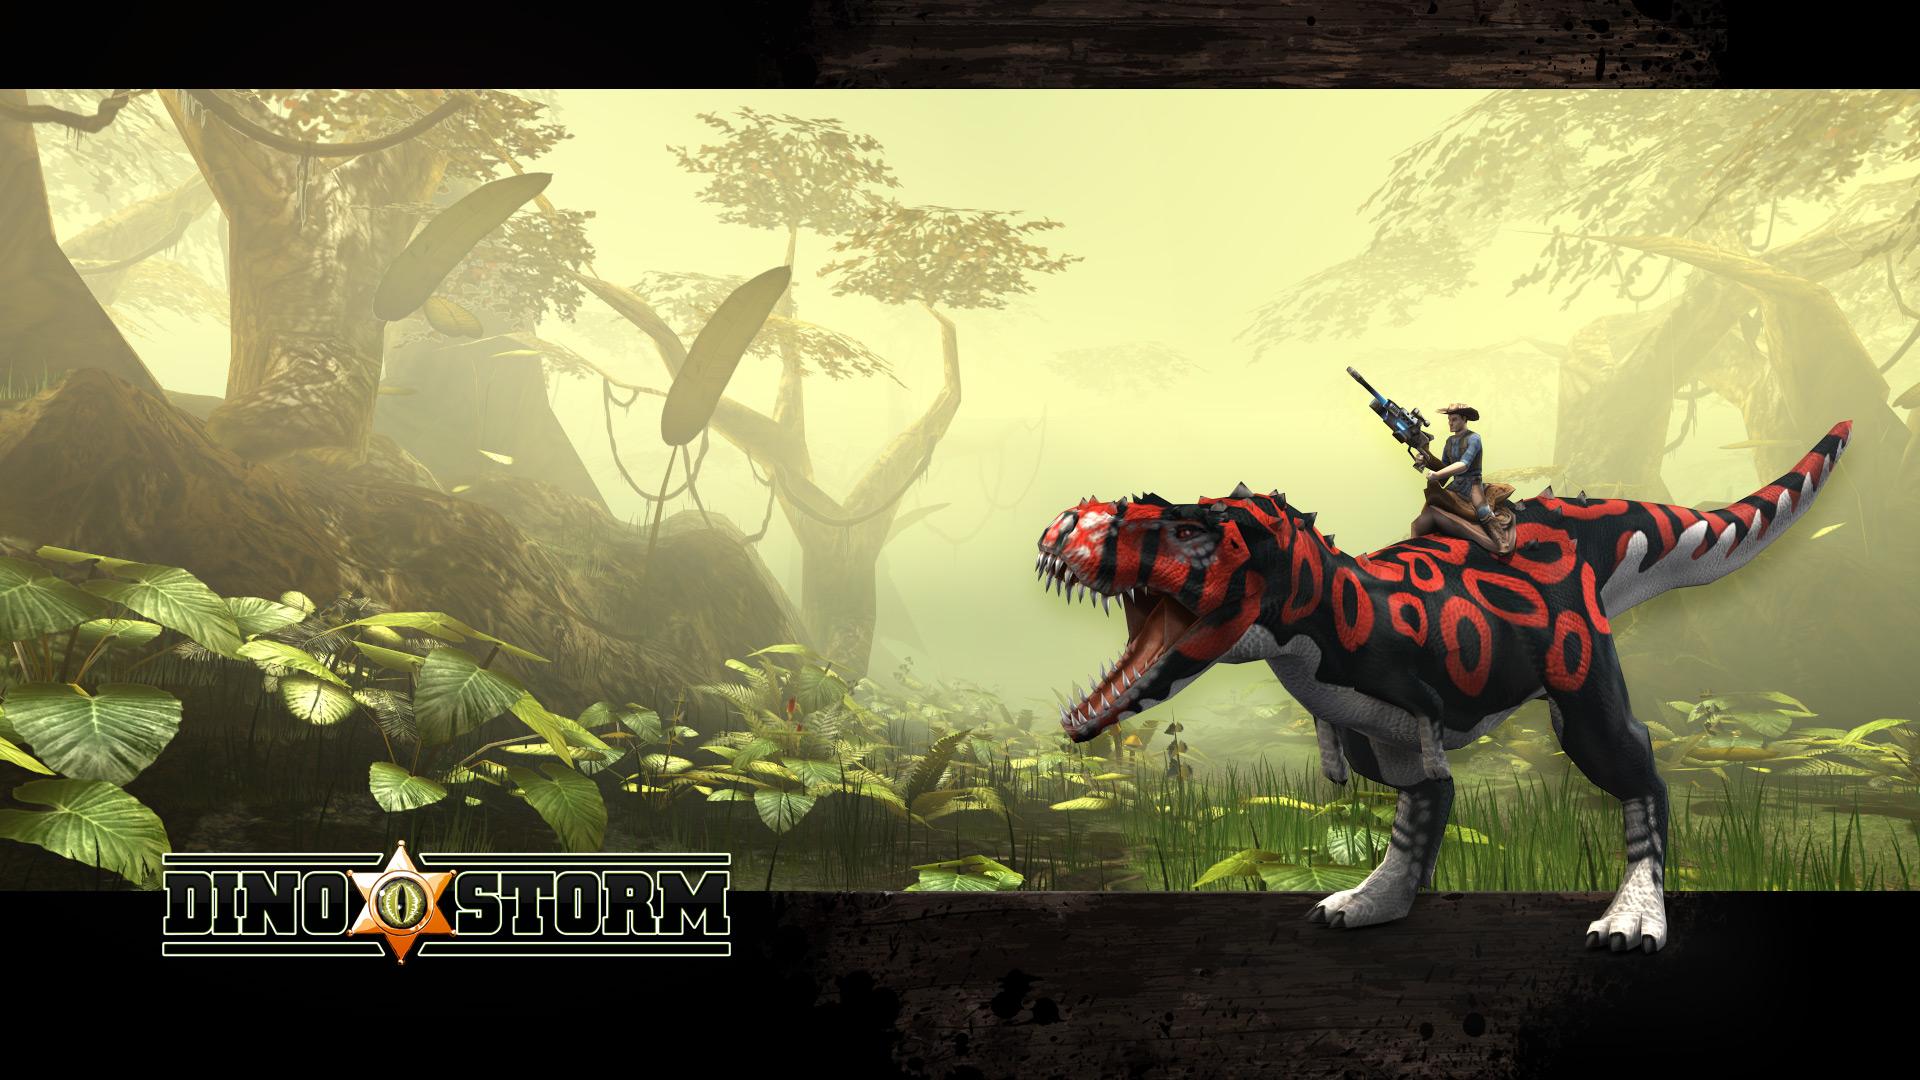 Dino Storm Media - Wallpaper, Artwork, Screenshots & More